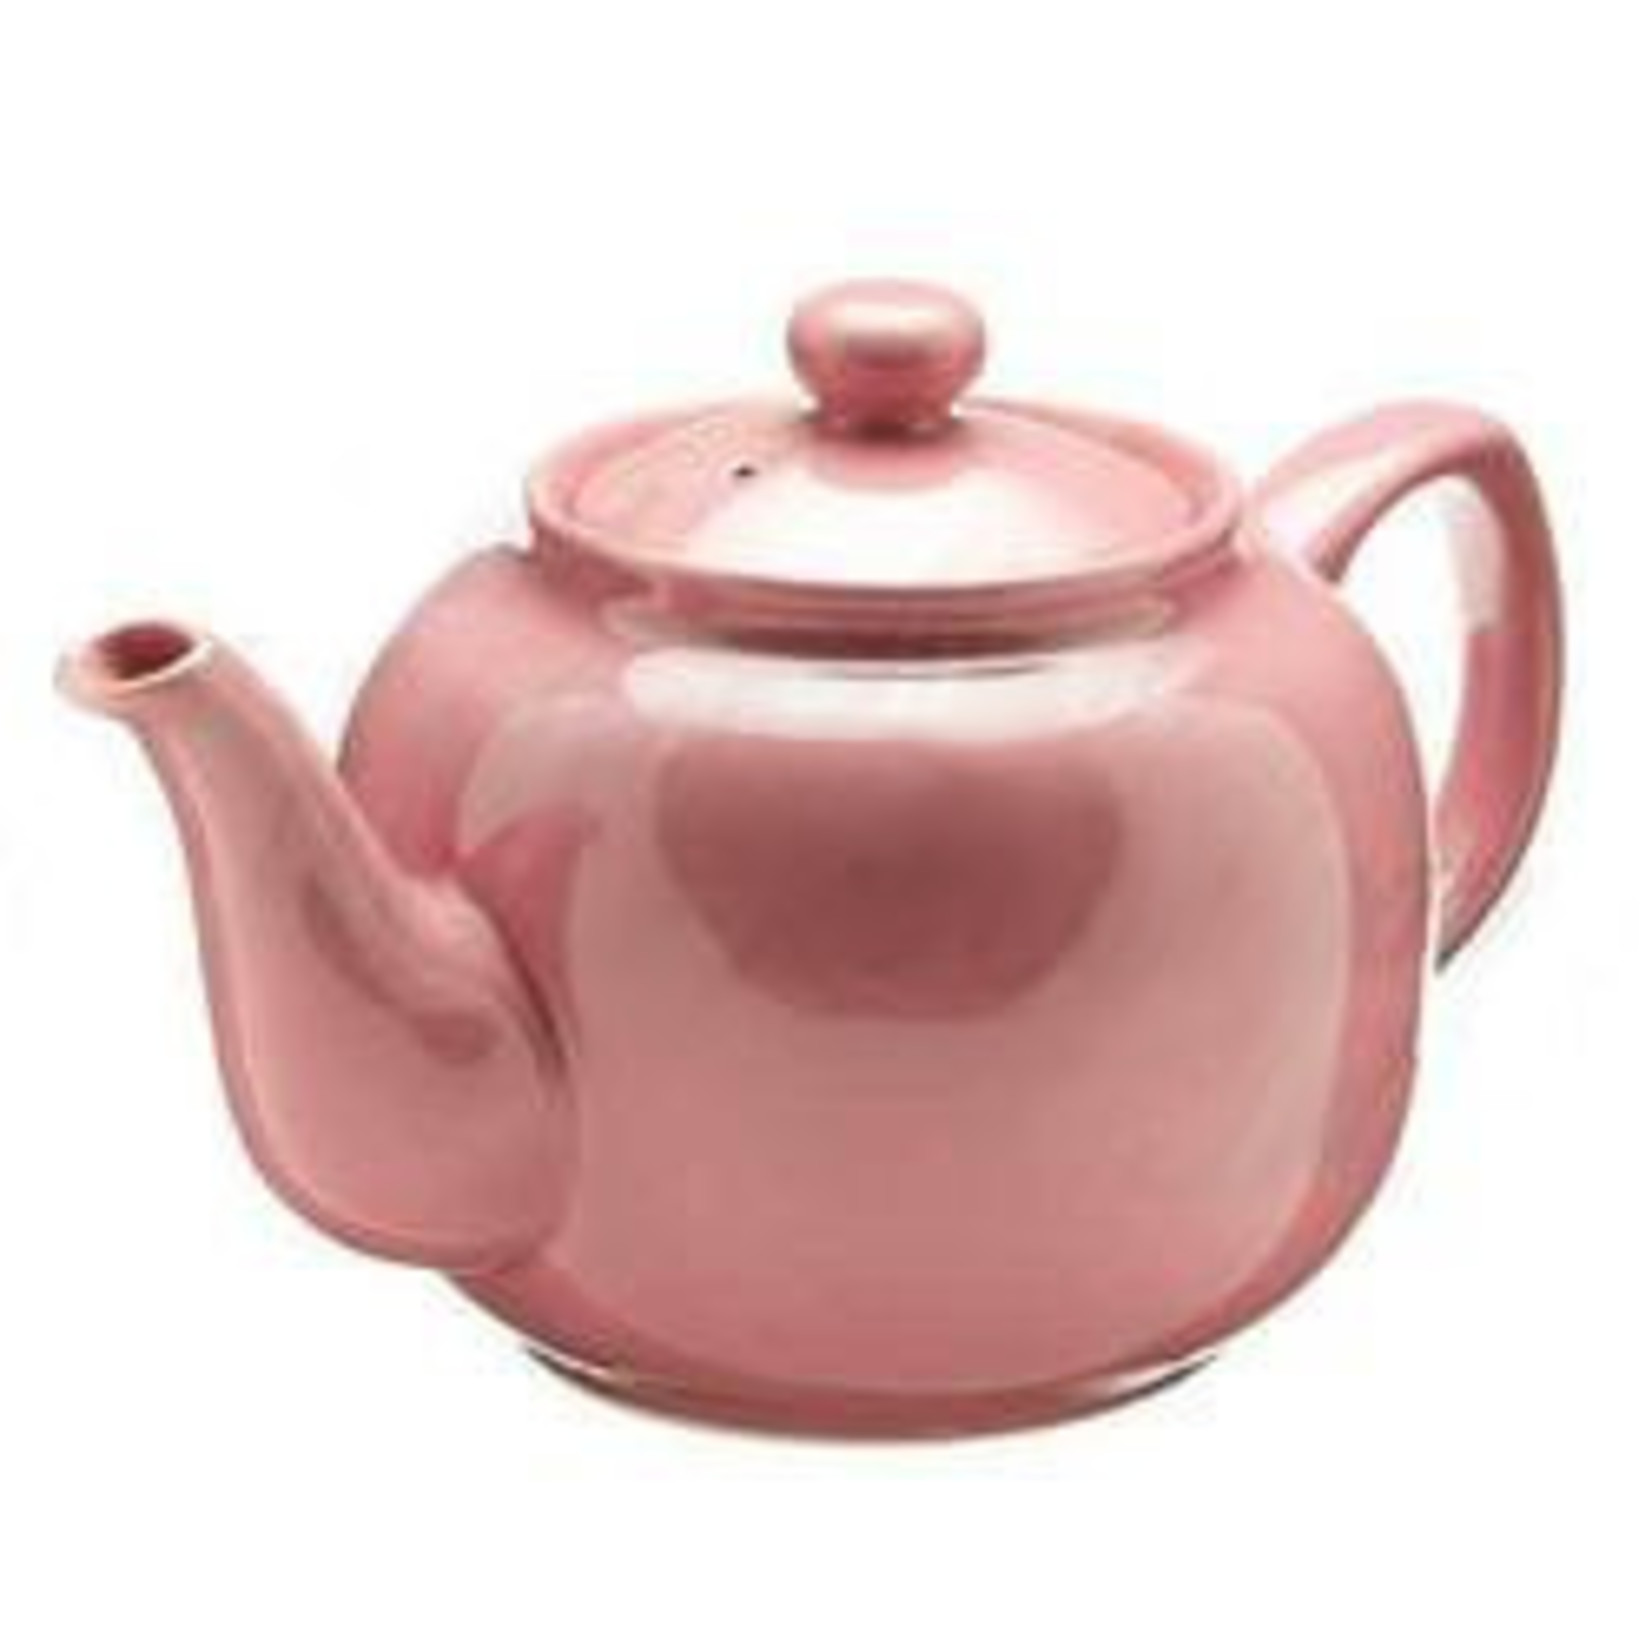 BrewBakers Windsor Tea Pot 6 Cup Sierra Rose